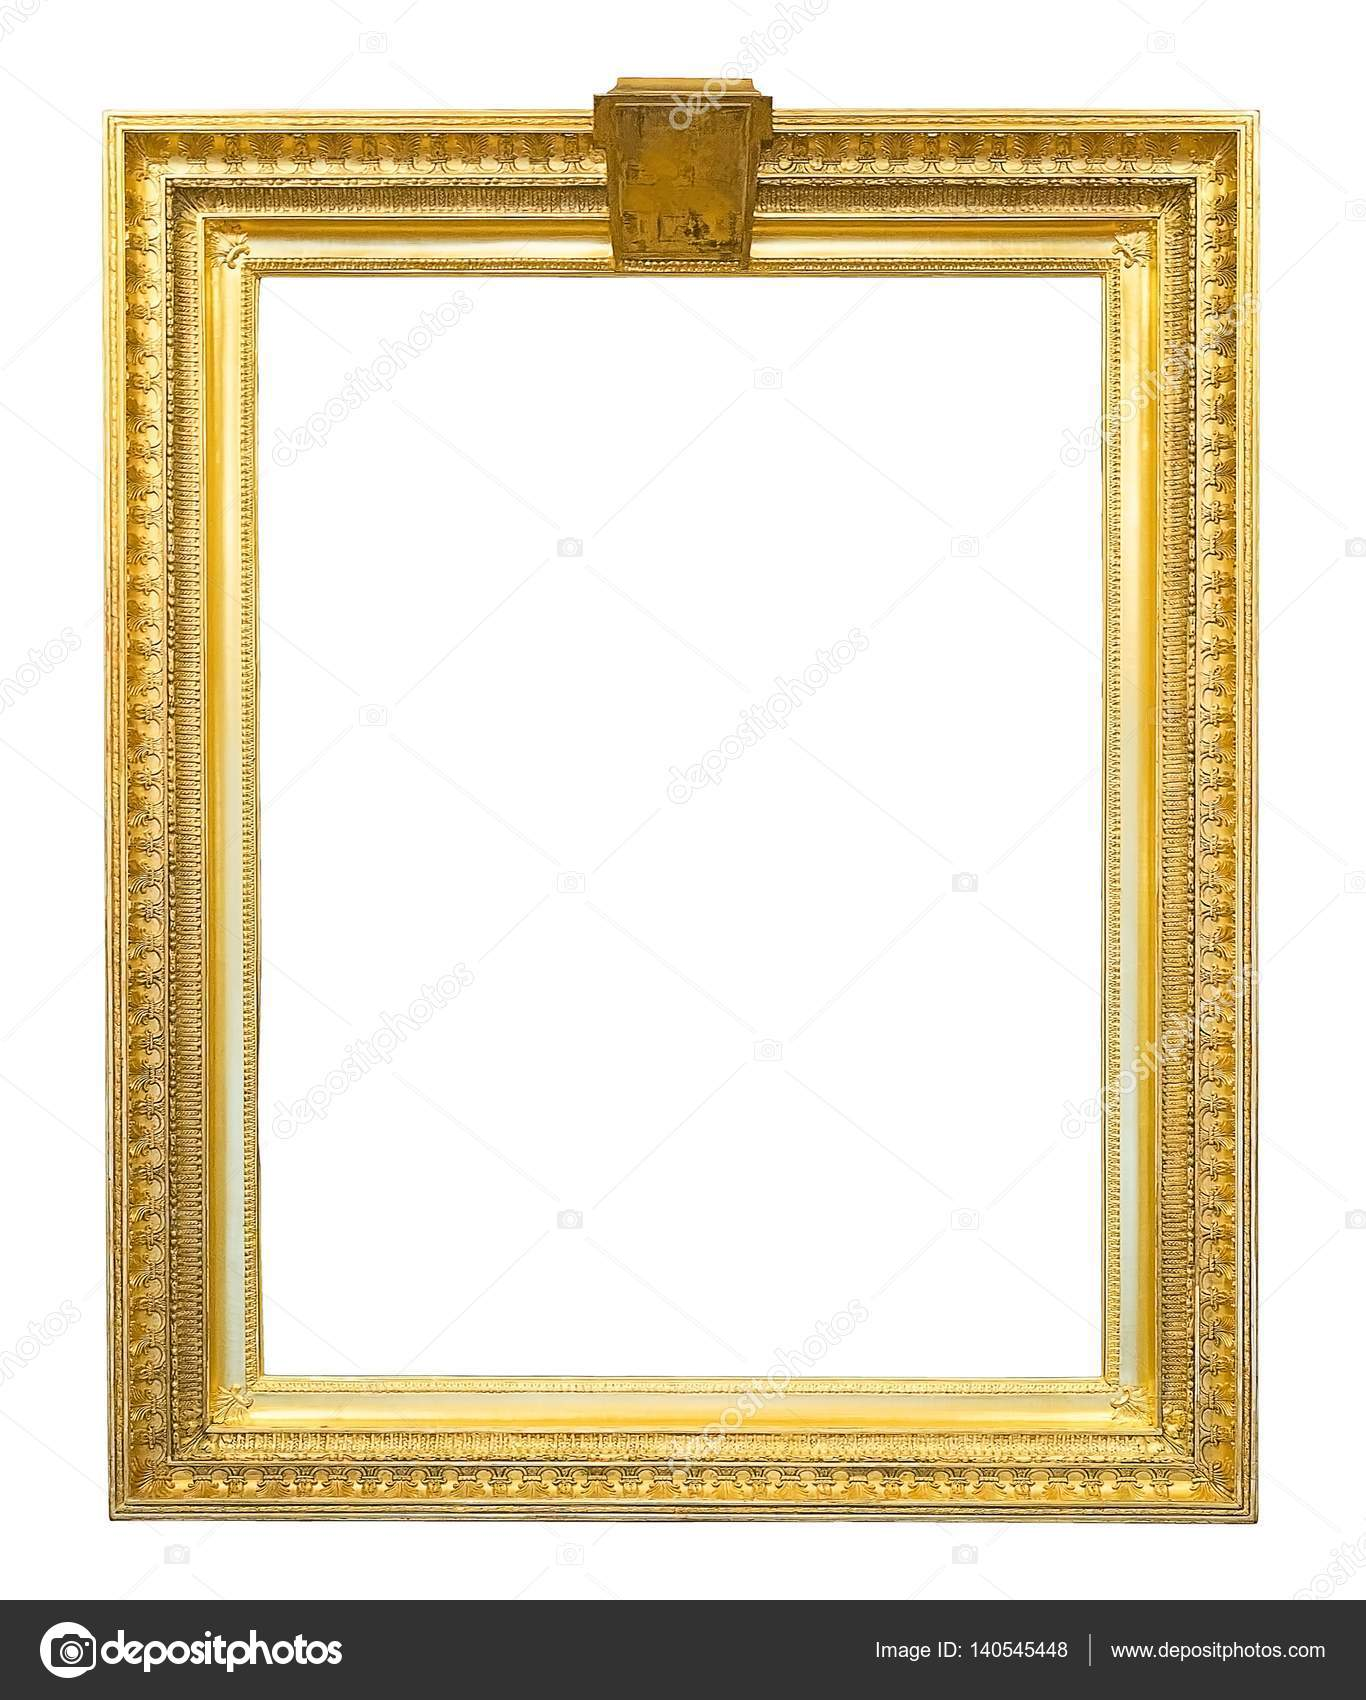 Goldene Bilderrahmen — Stockfoto © Prokrida #140545448